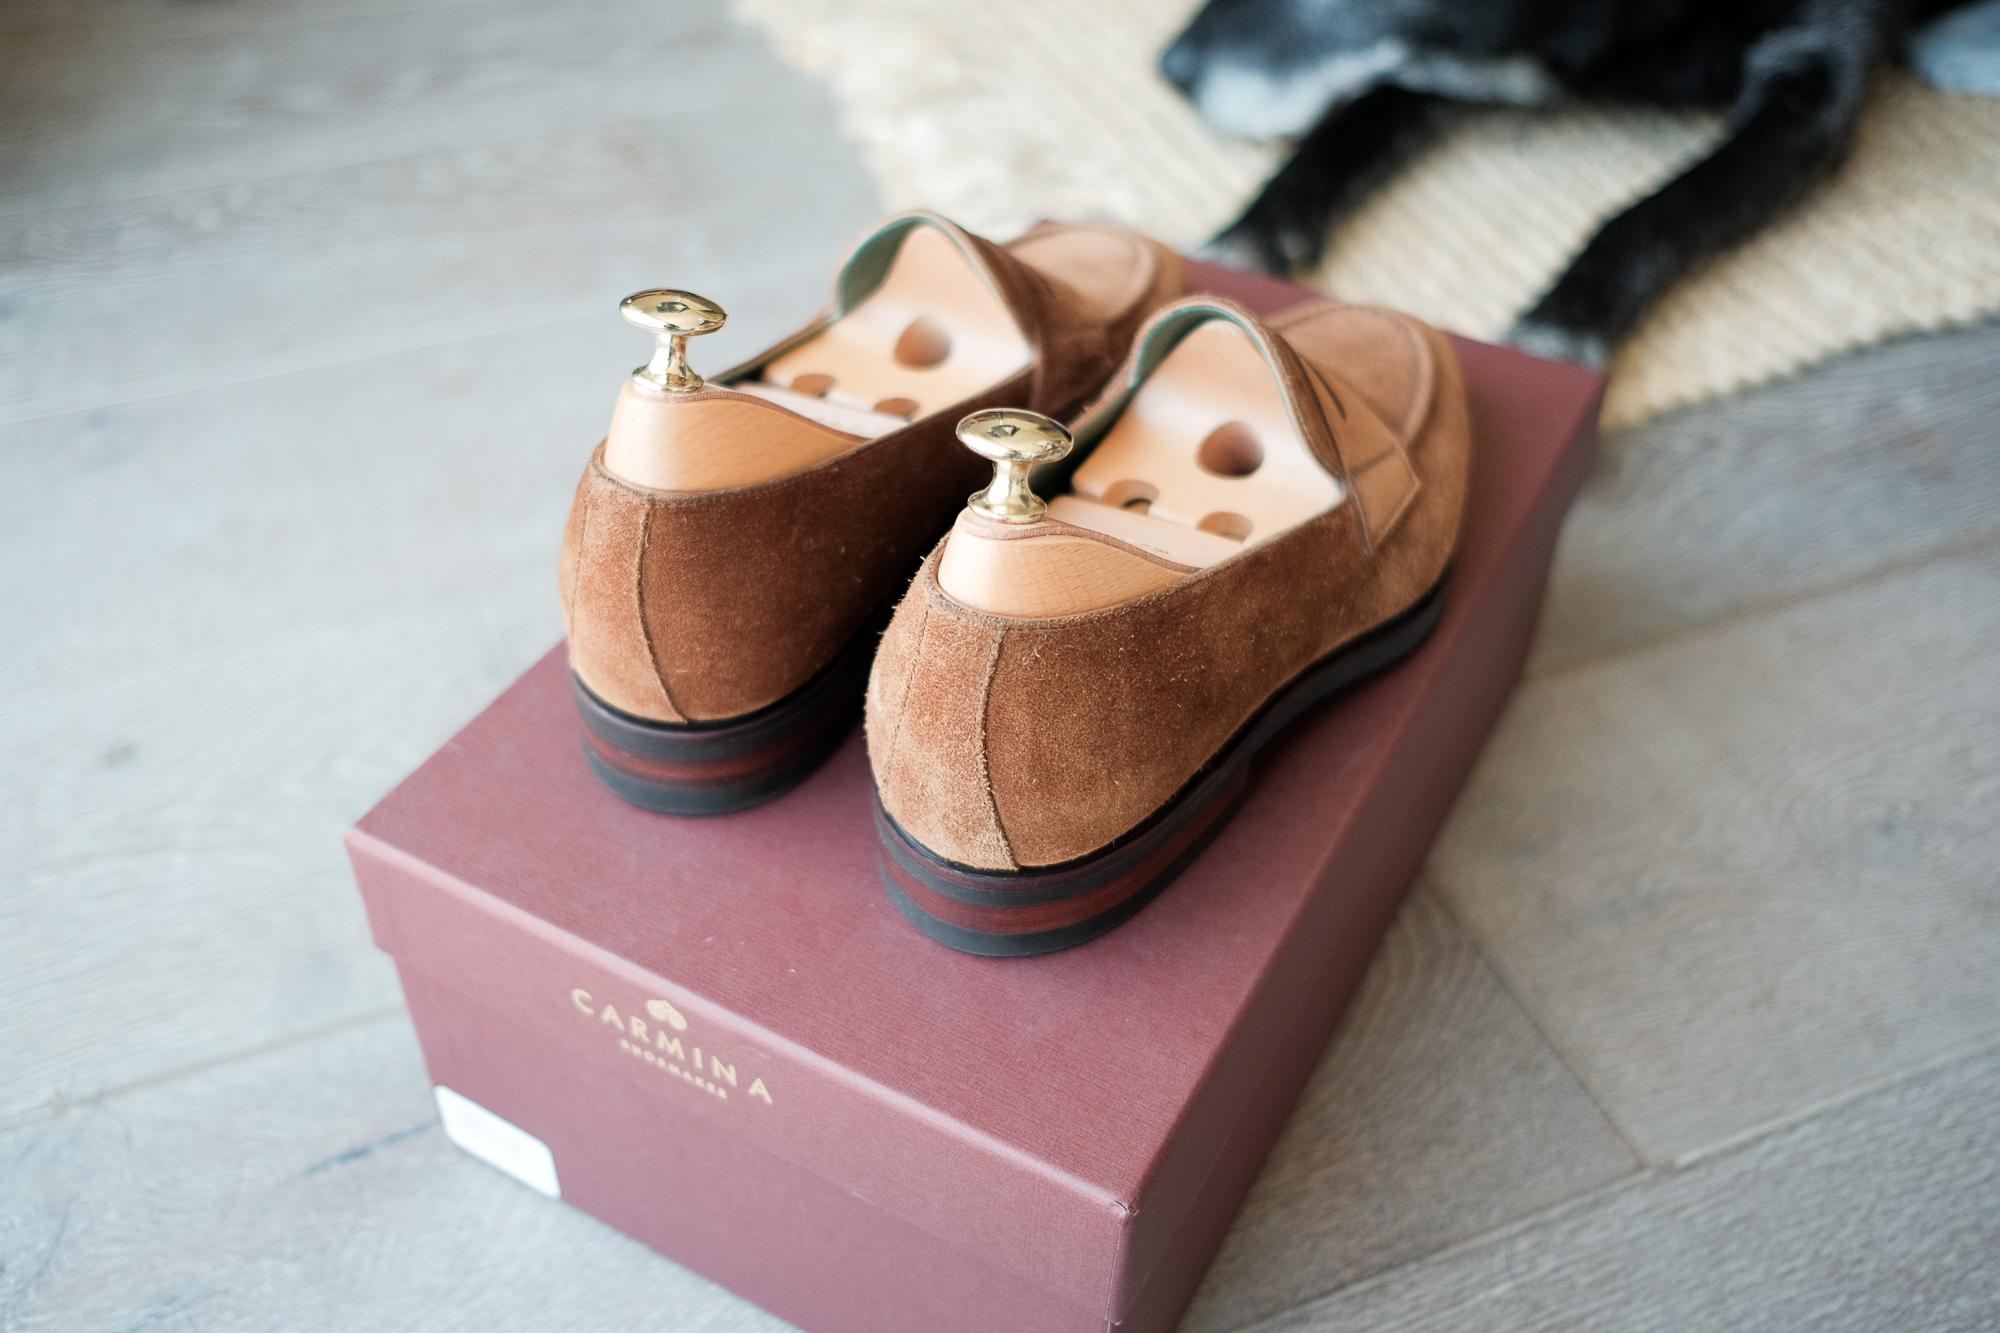 carmina_loafers-2.jpg